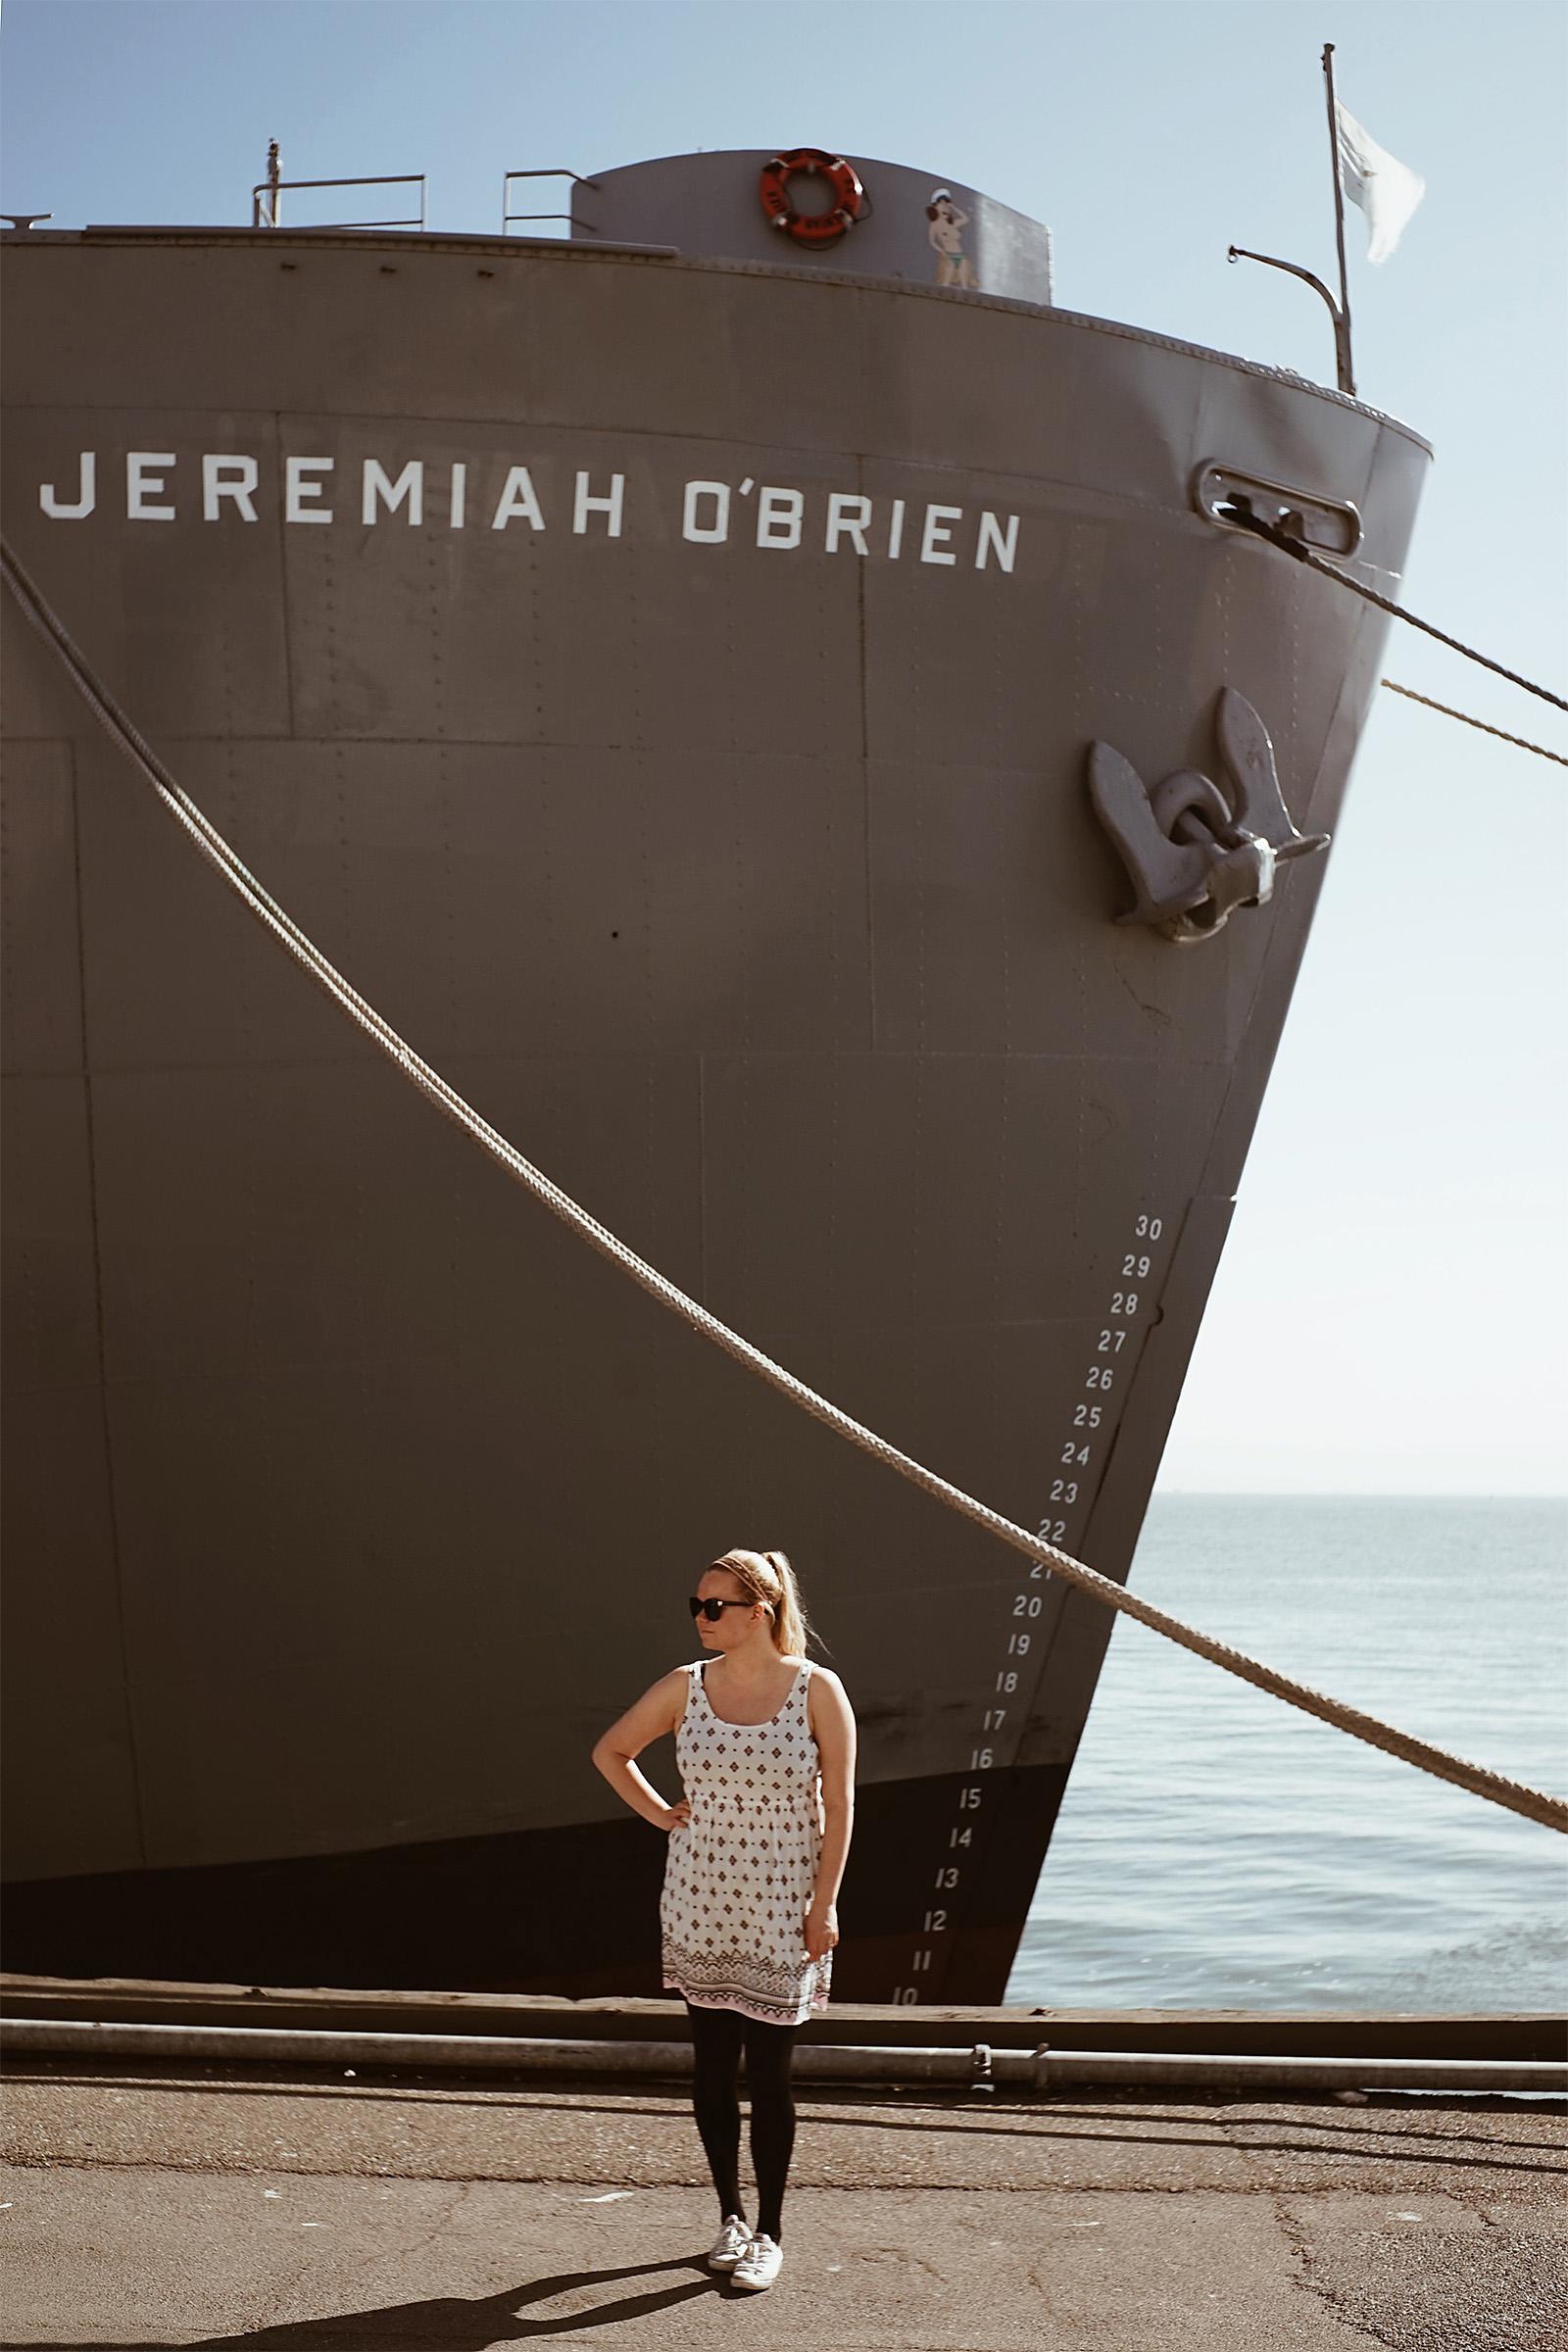 jeremiahobrien